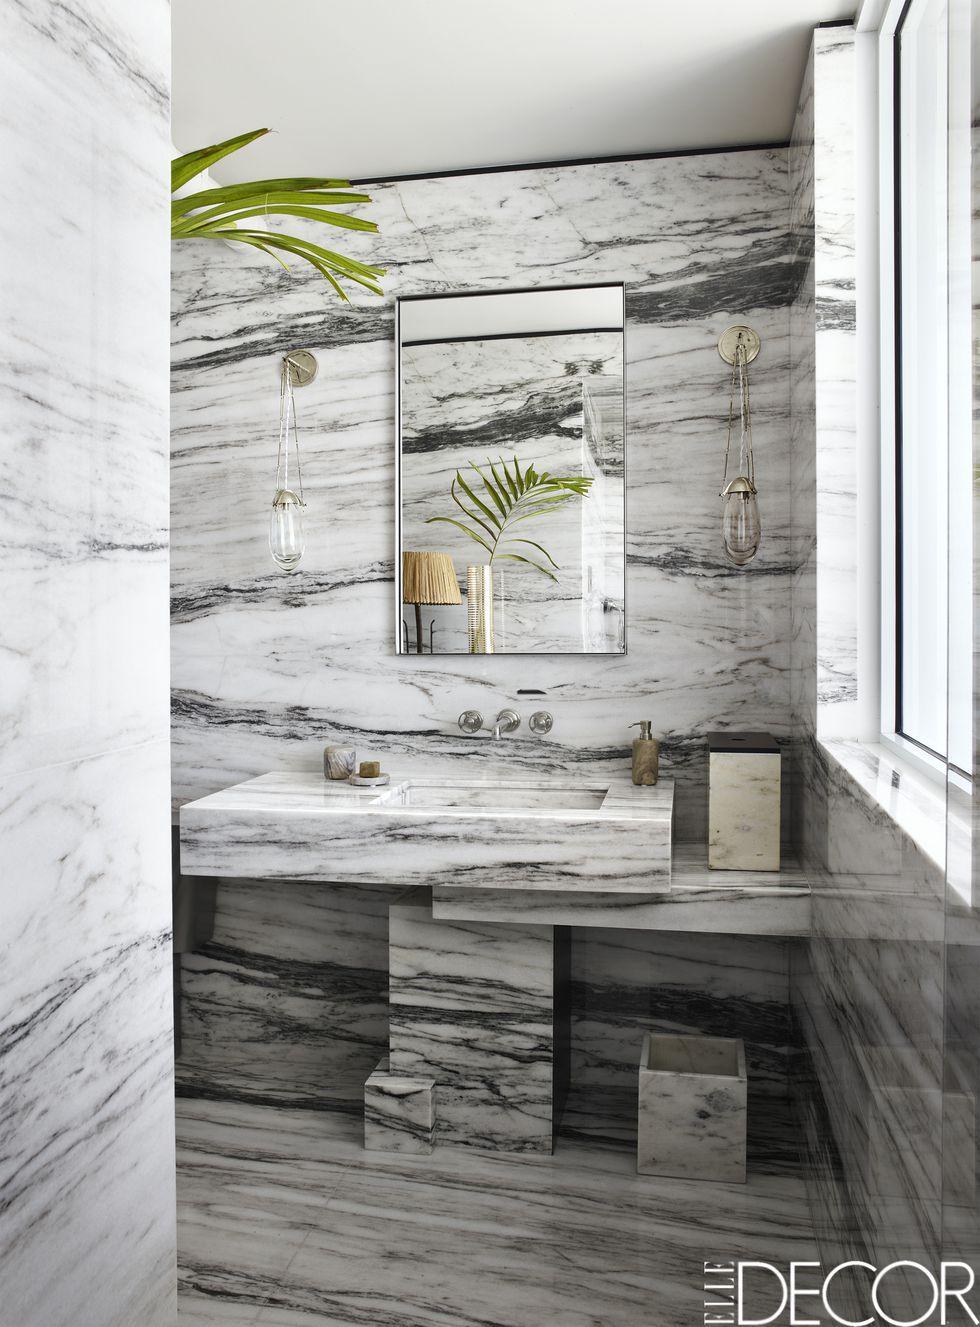 55 small bathroom ideas best designs decor for small bathrooms rh elledecor com